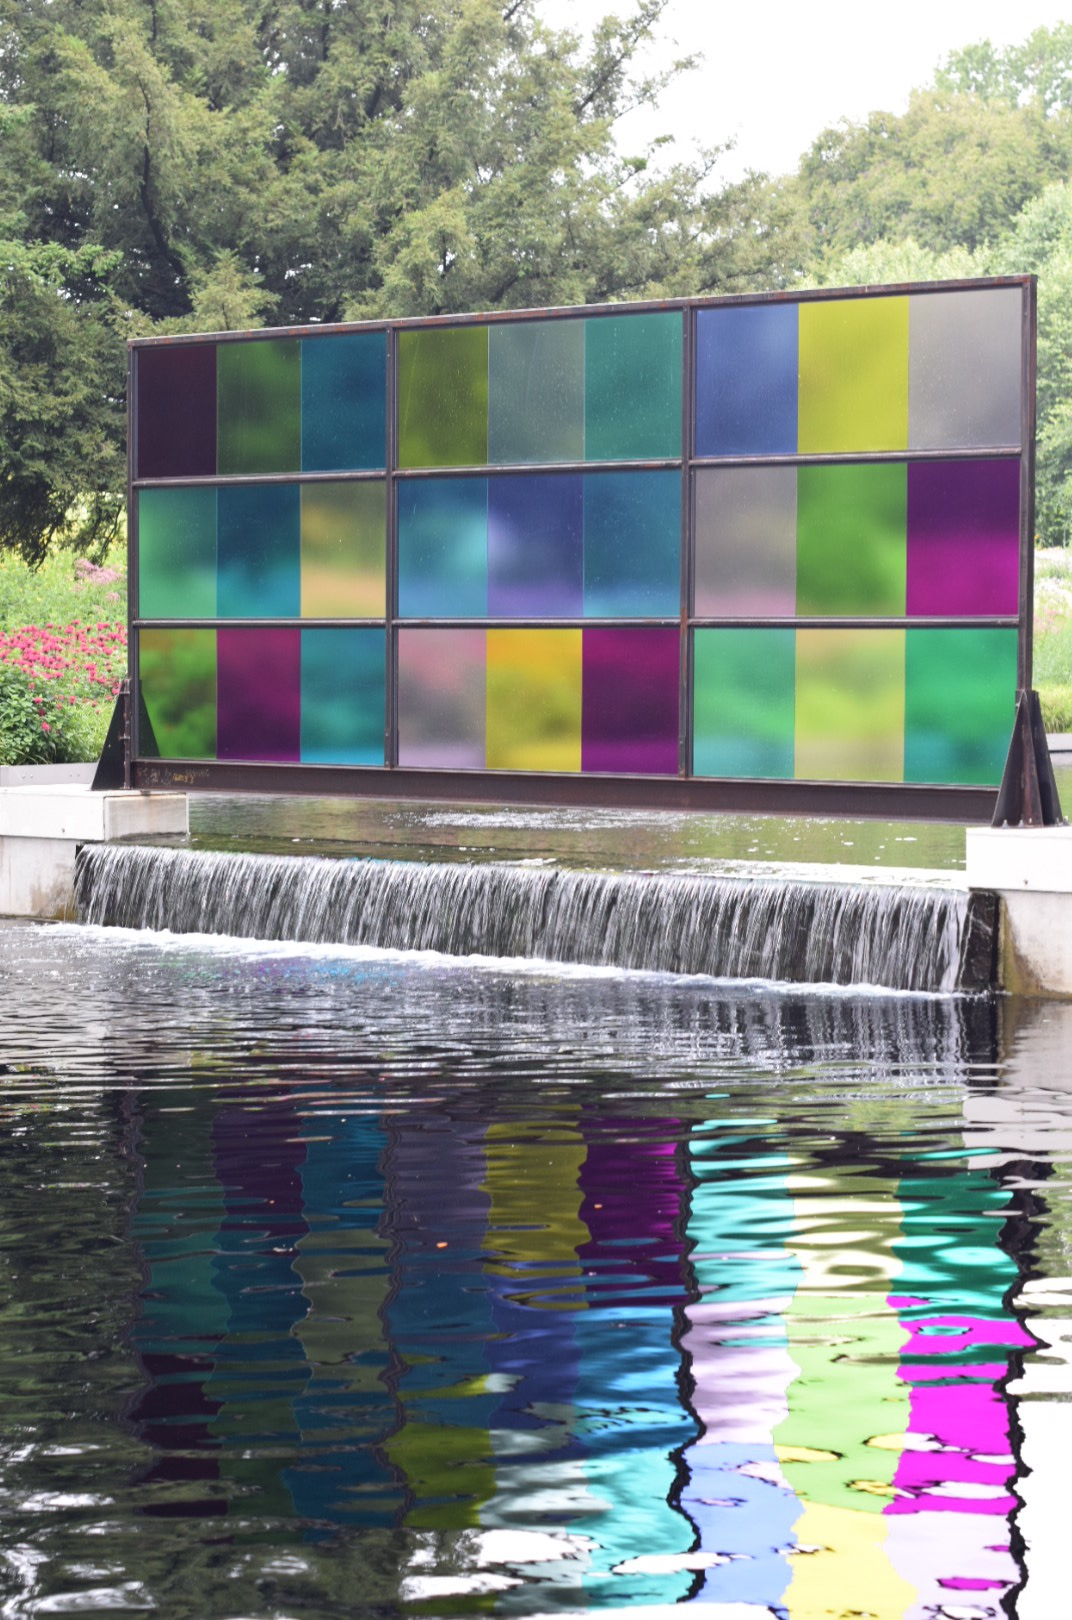 Chihuly Exhibit New York Botanical Gardens